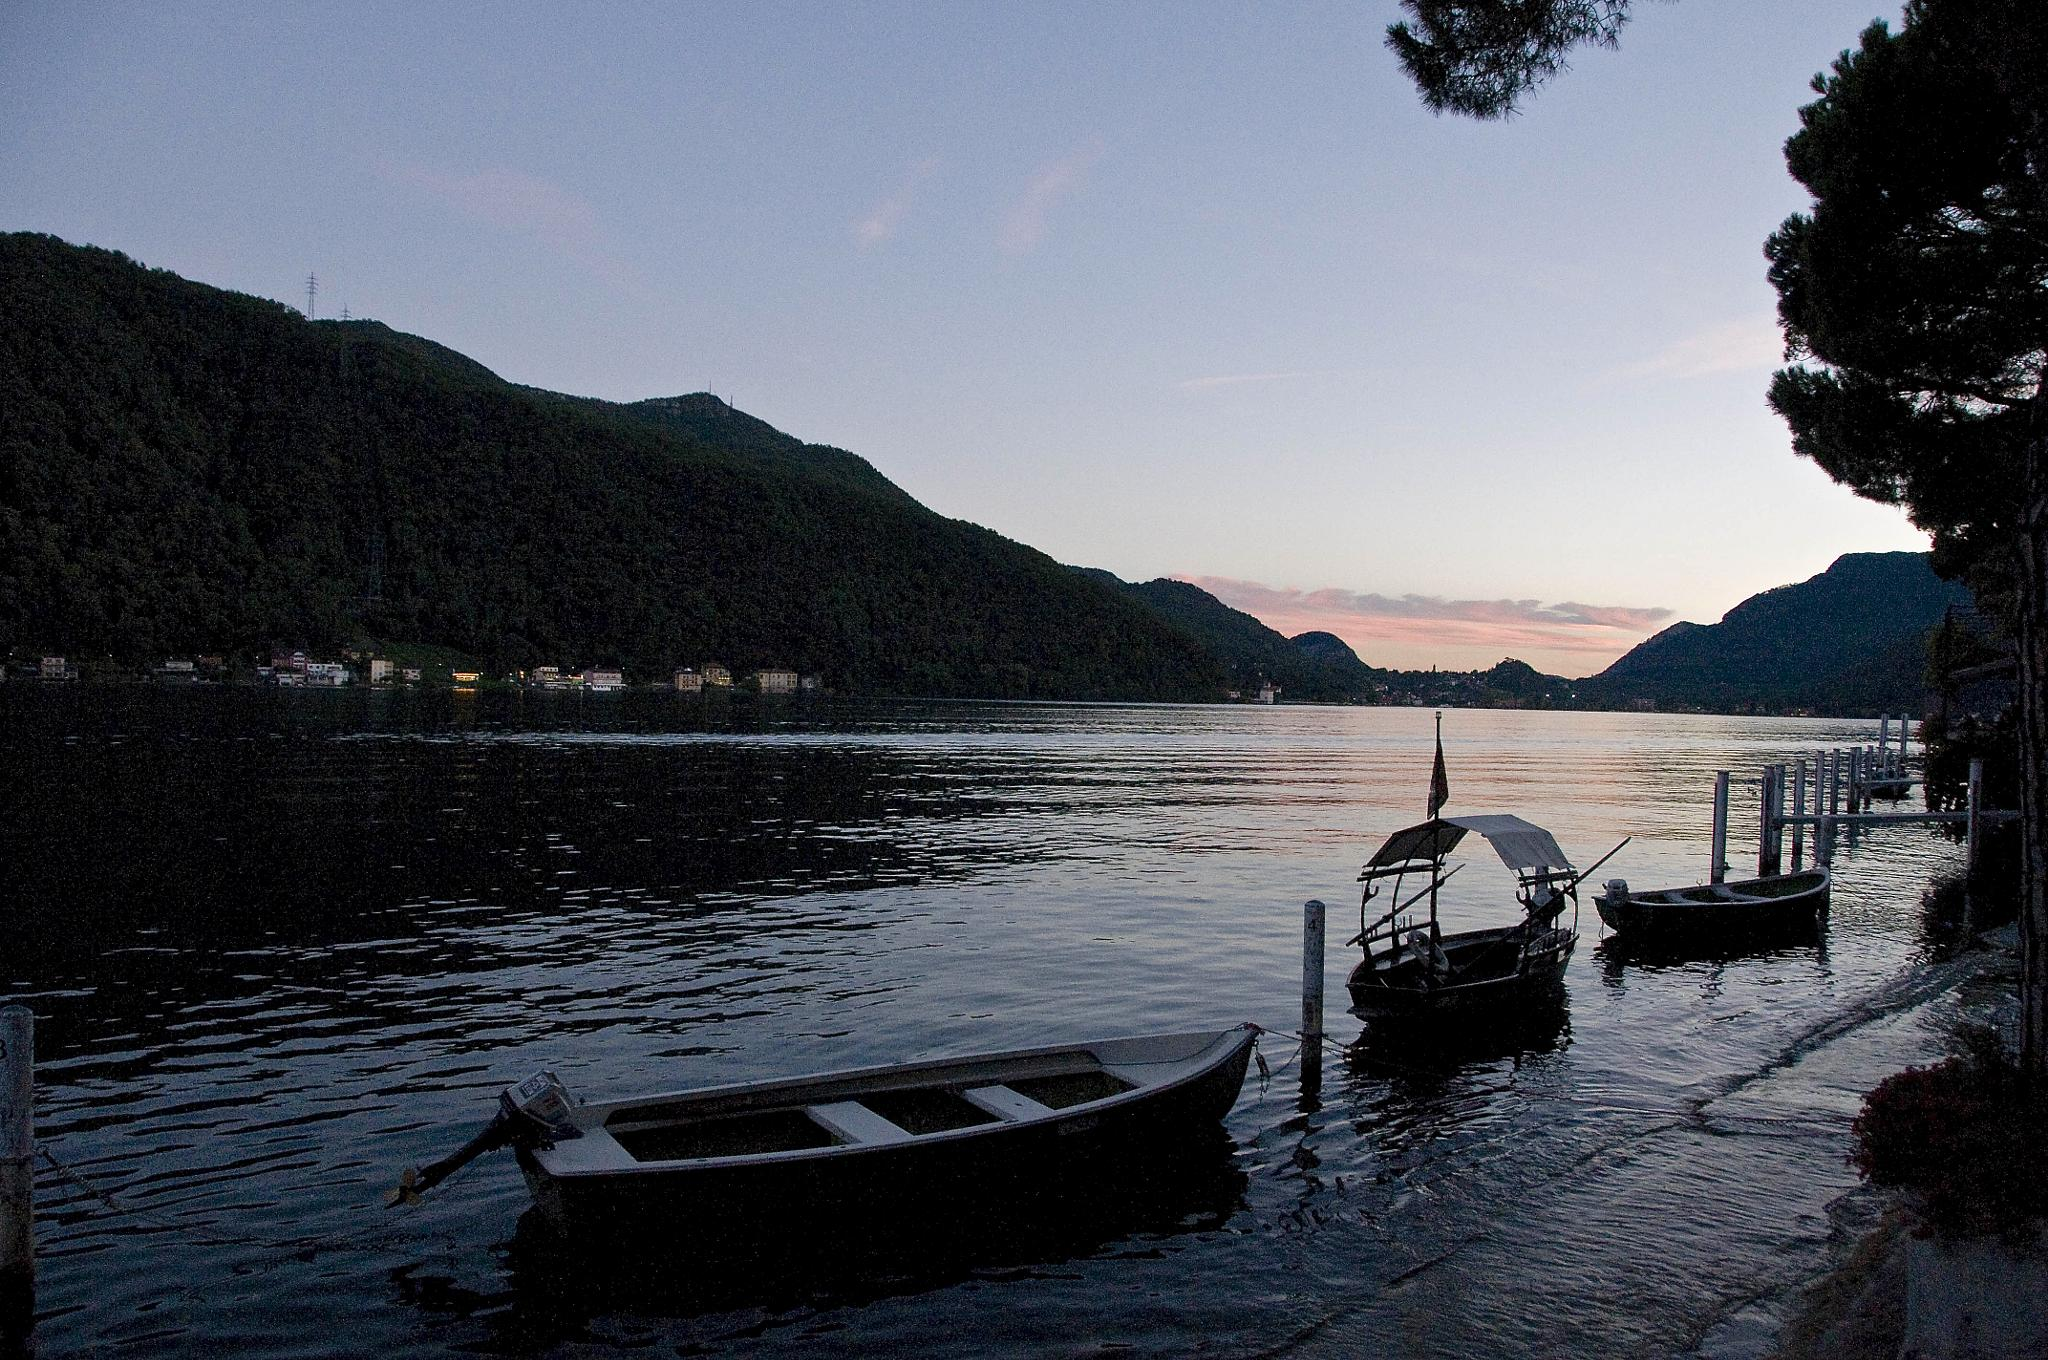 Evening on Lake Lugano by Riah